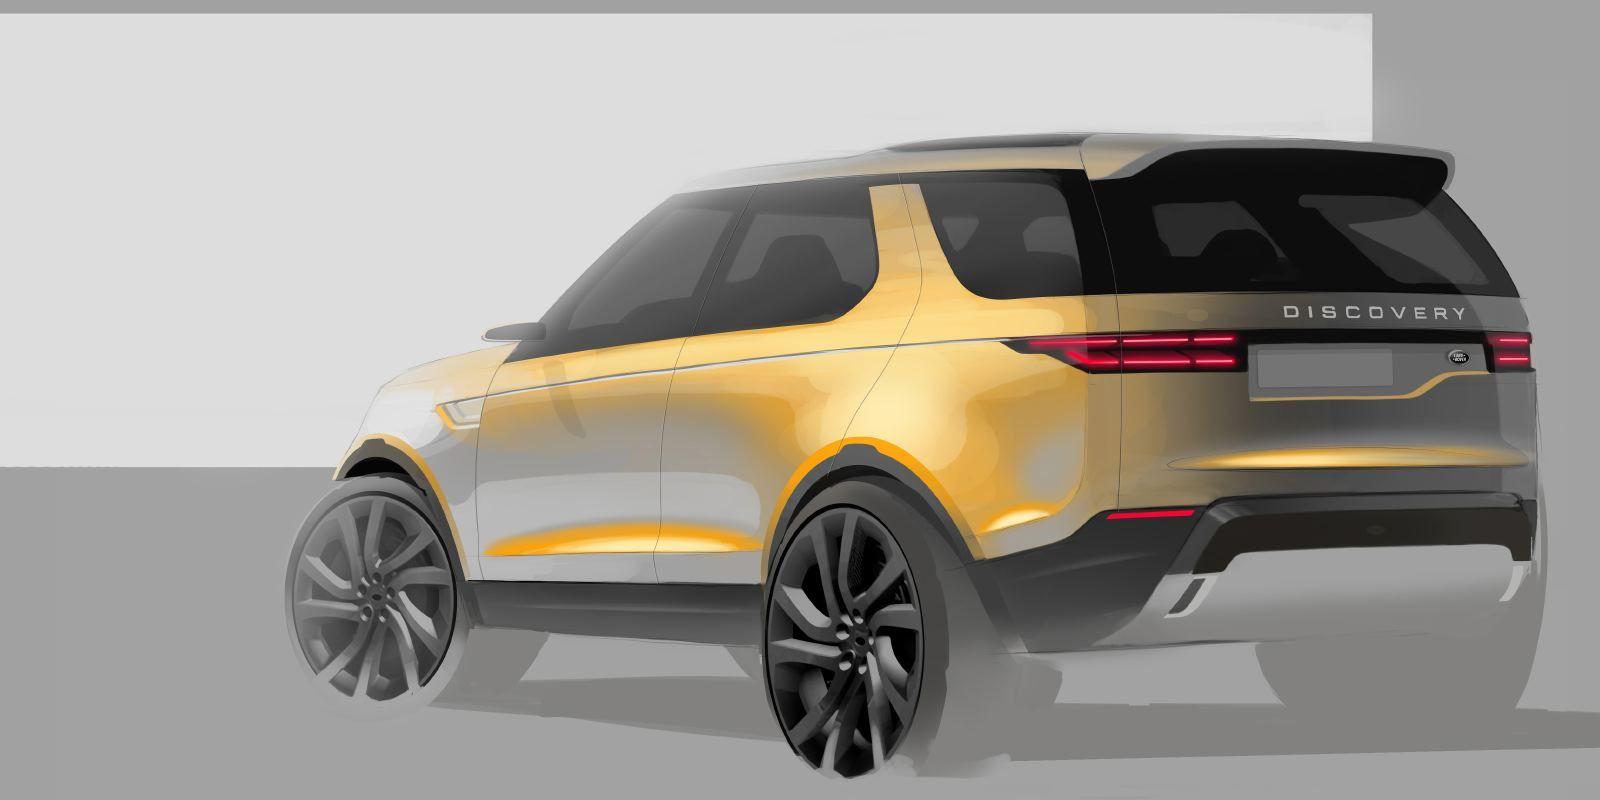 Land Rover Discovery Sport Concept Sketch Car design